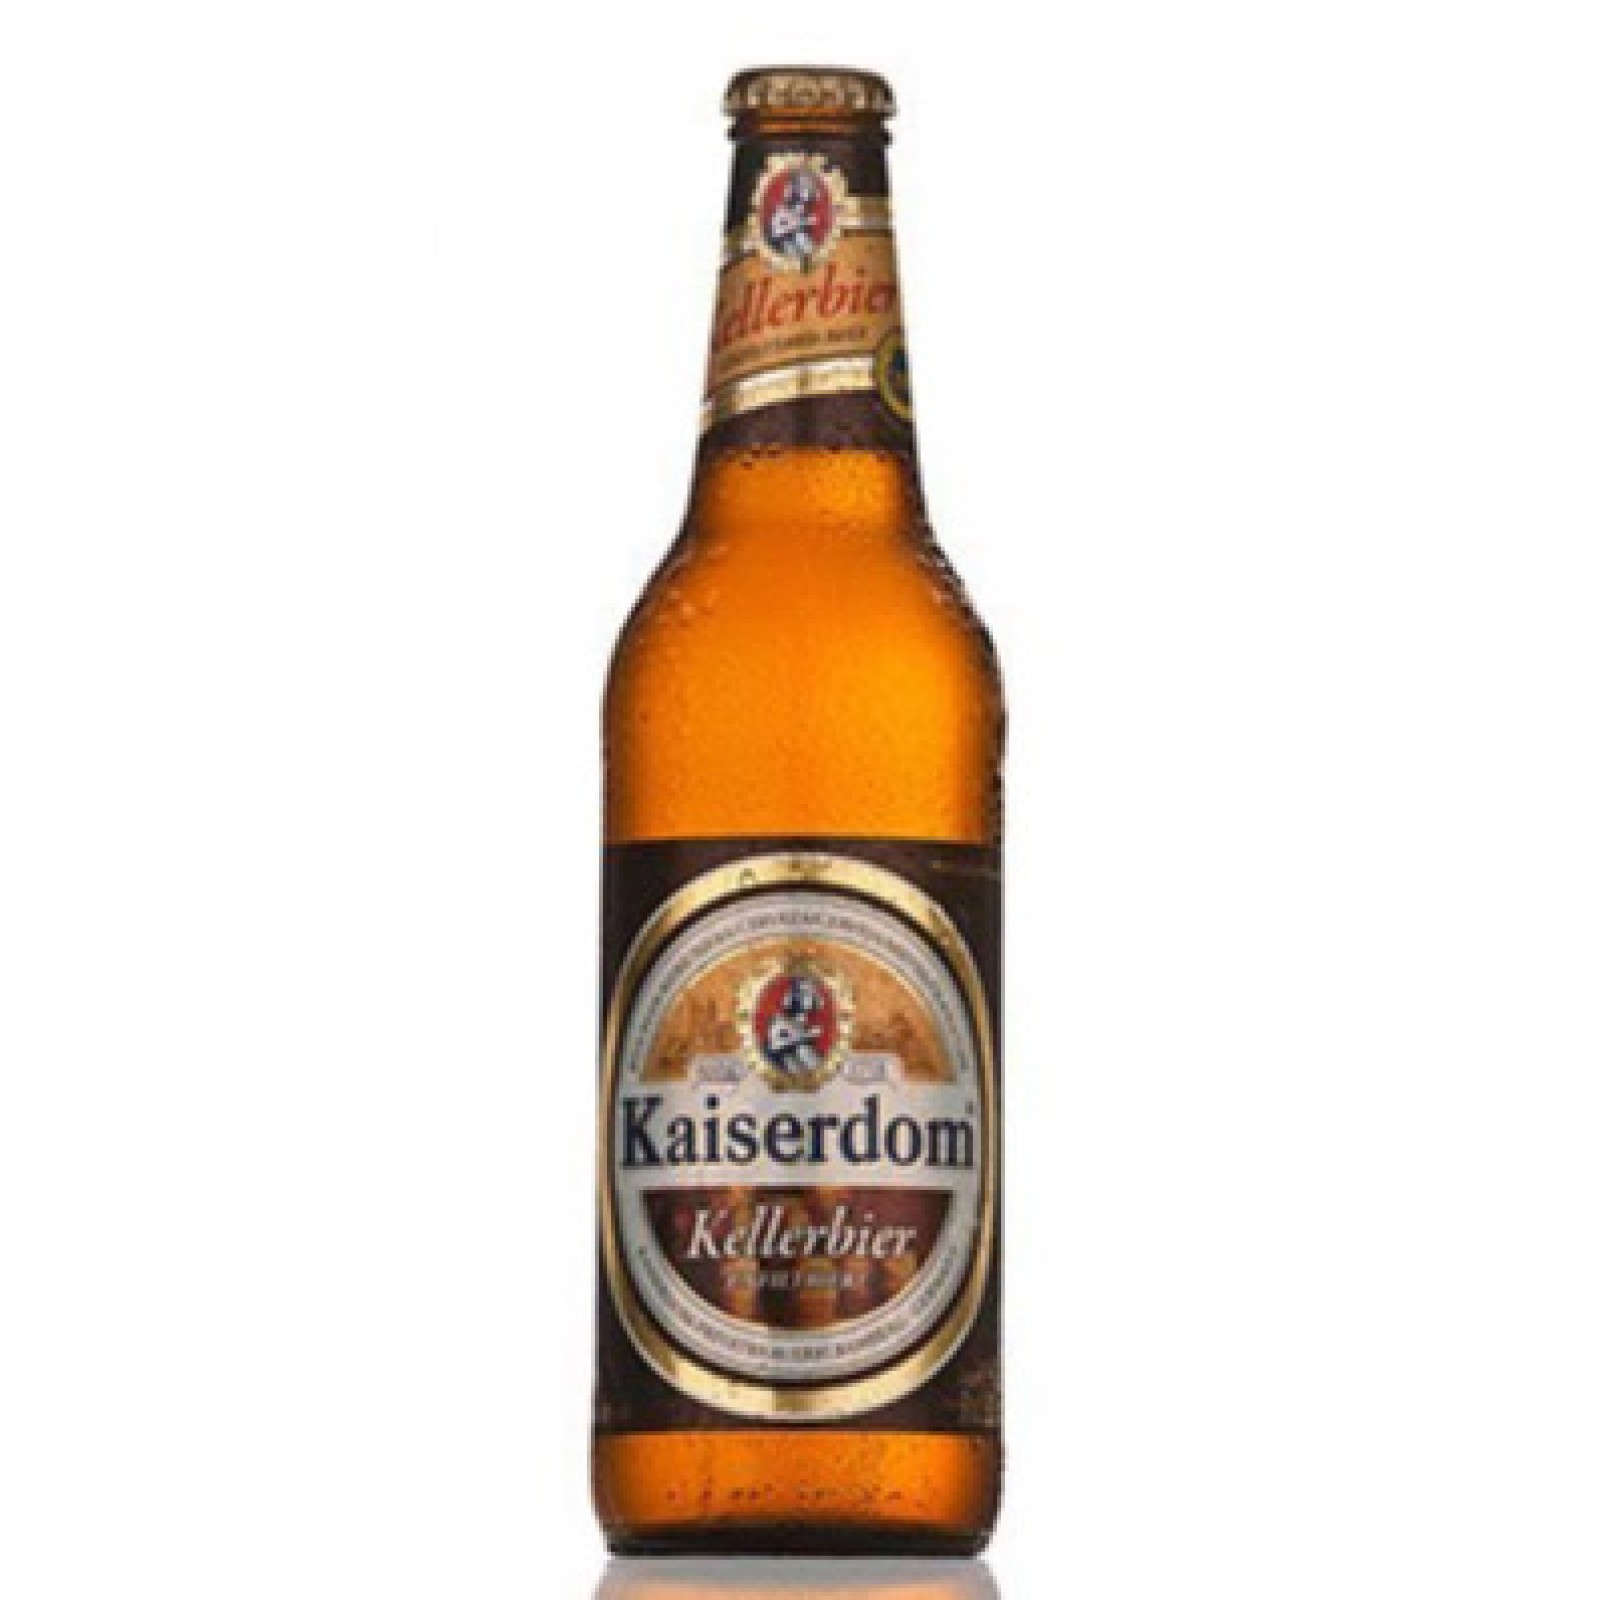 Kaiserdom Kellerbier 4.8% 500ml